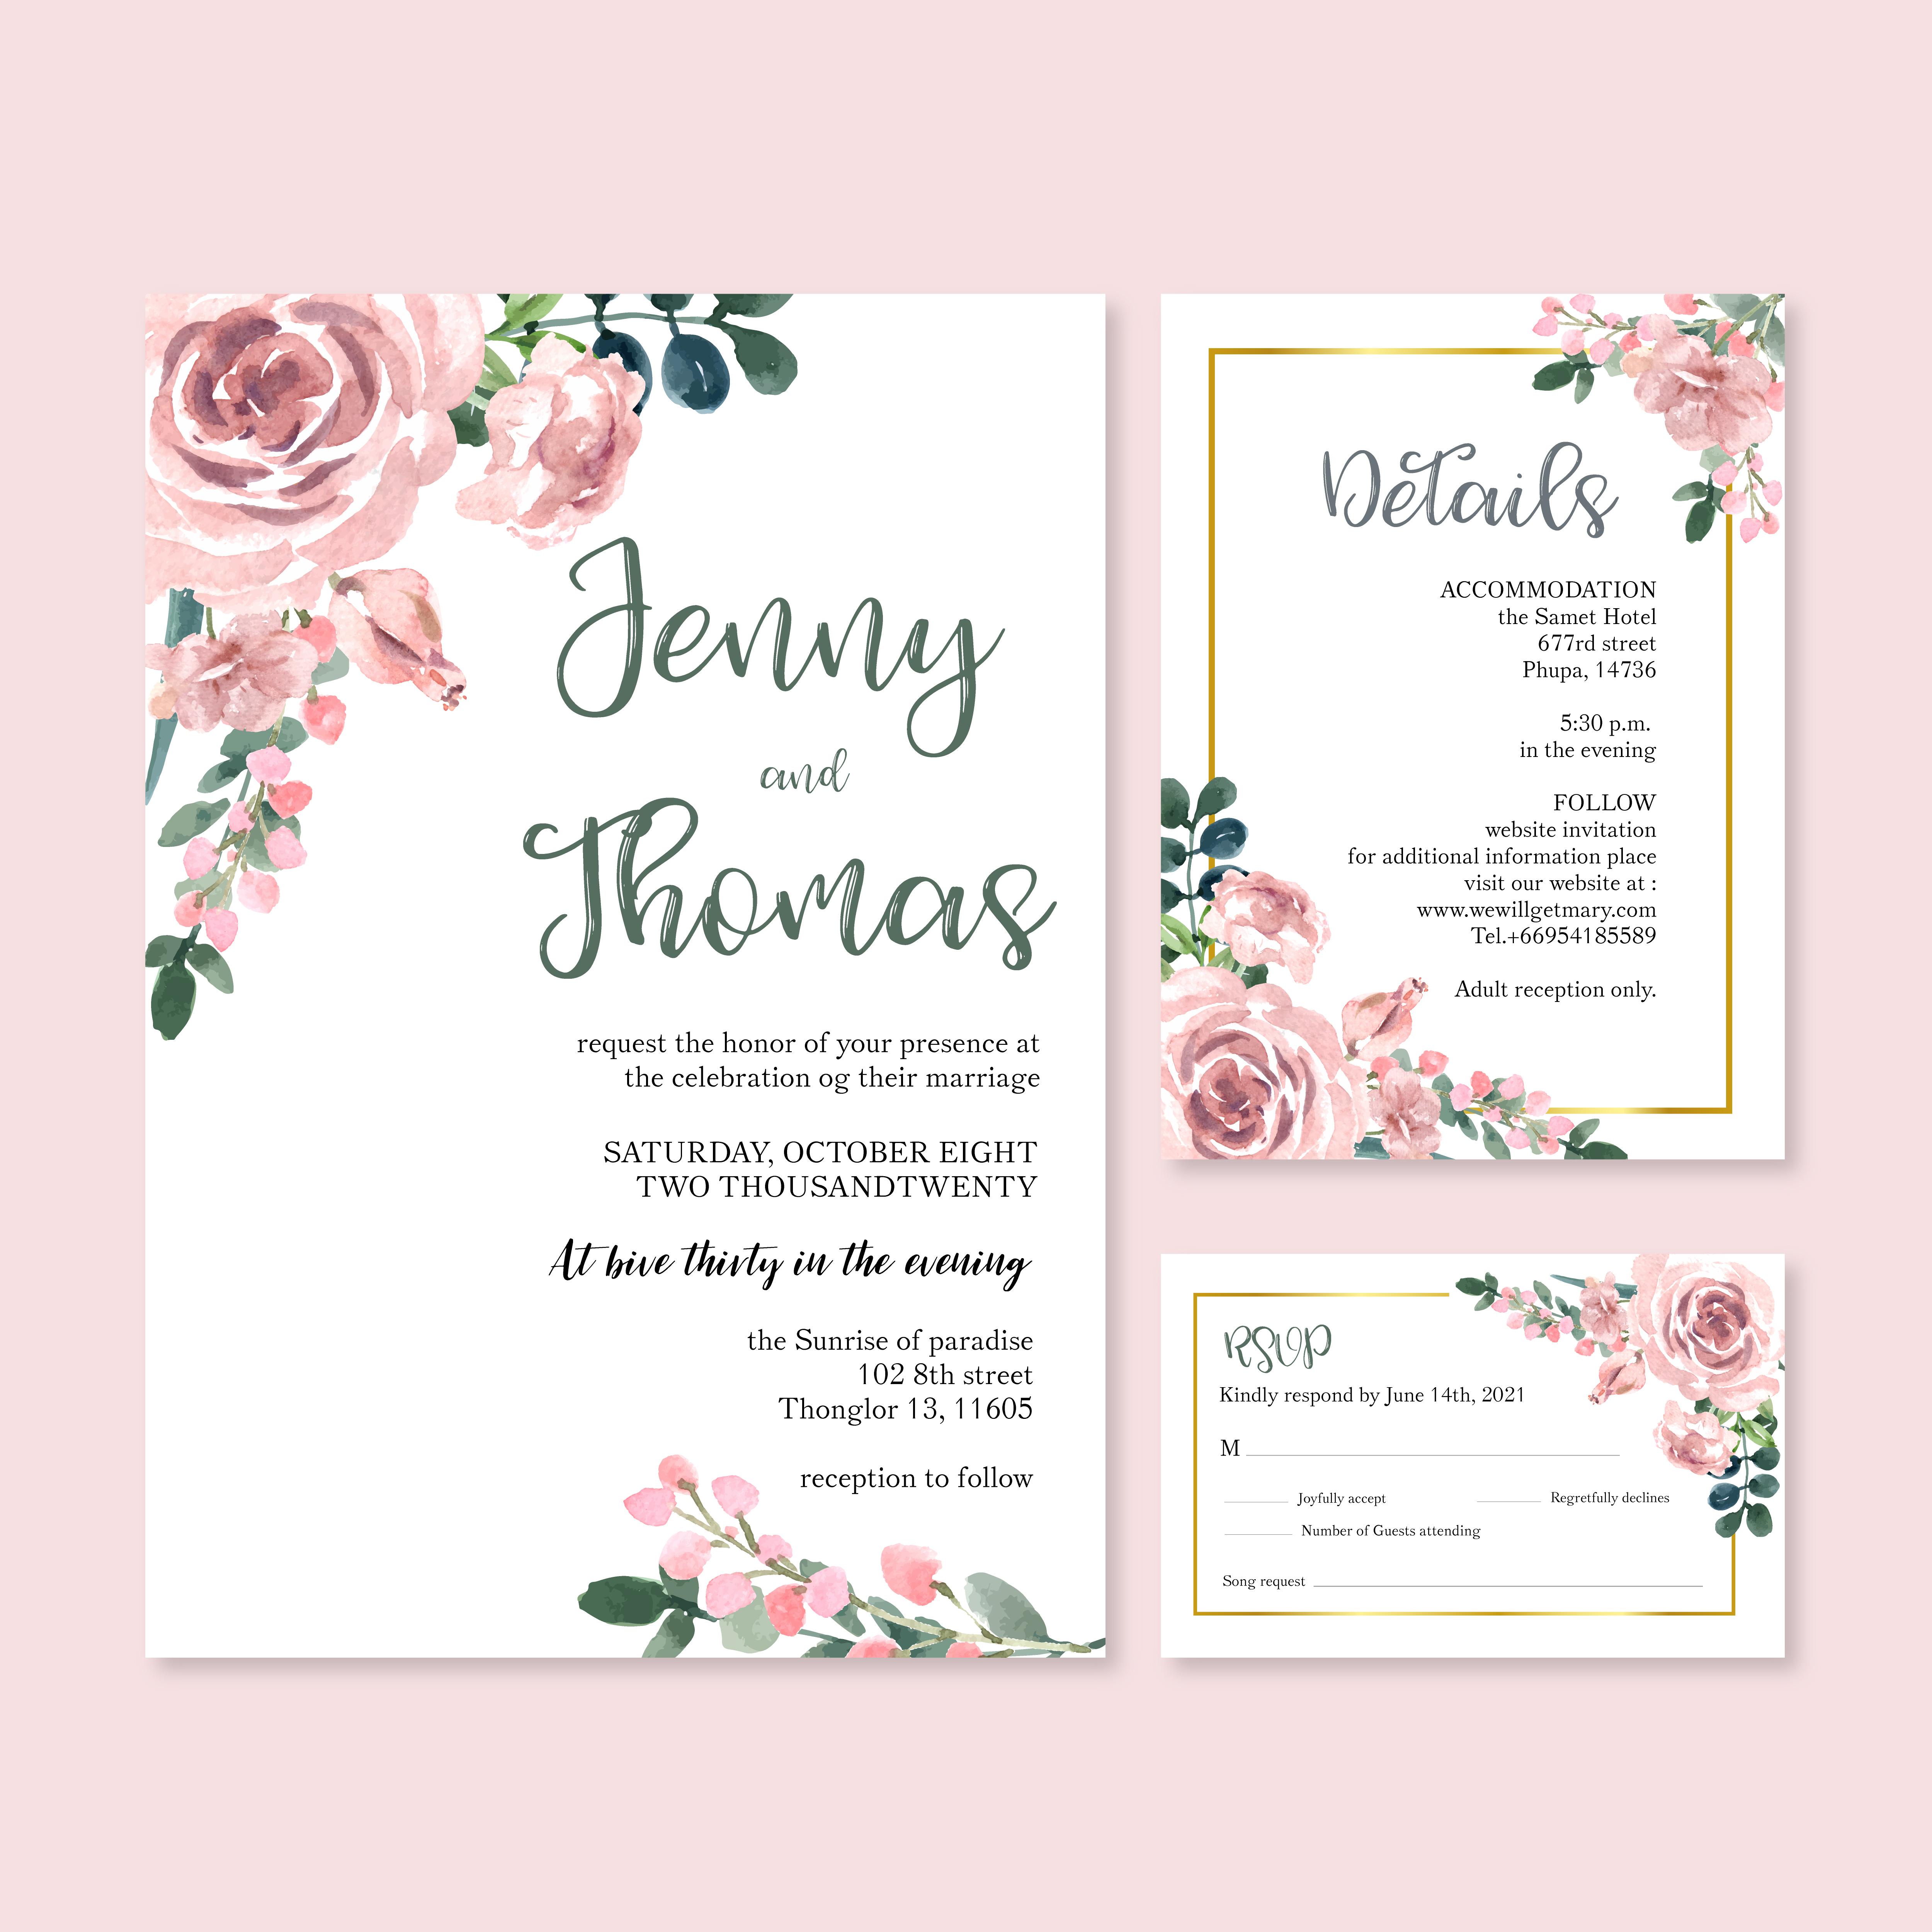 happy wedding card floral garden invitation card marriage